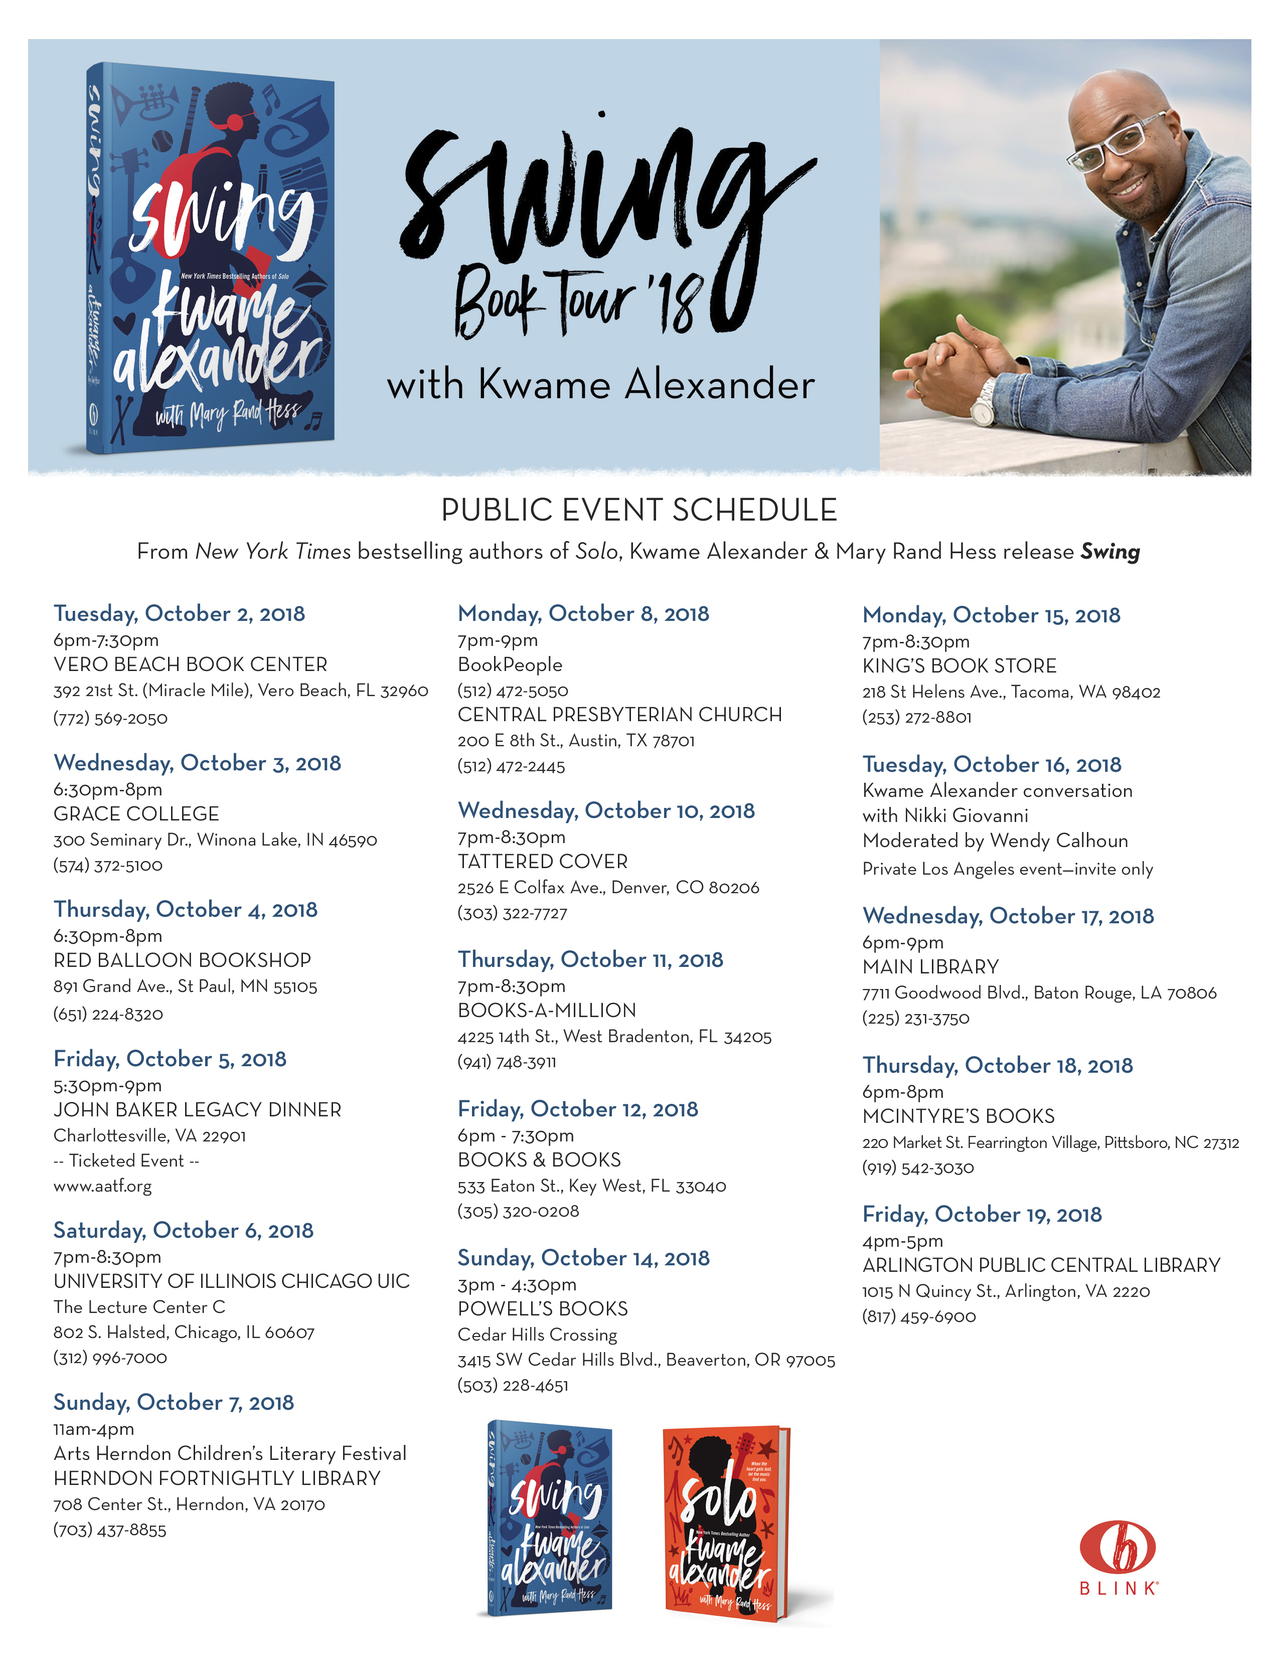 Swing Book Tour 2018 Schedule